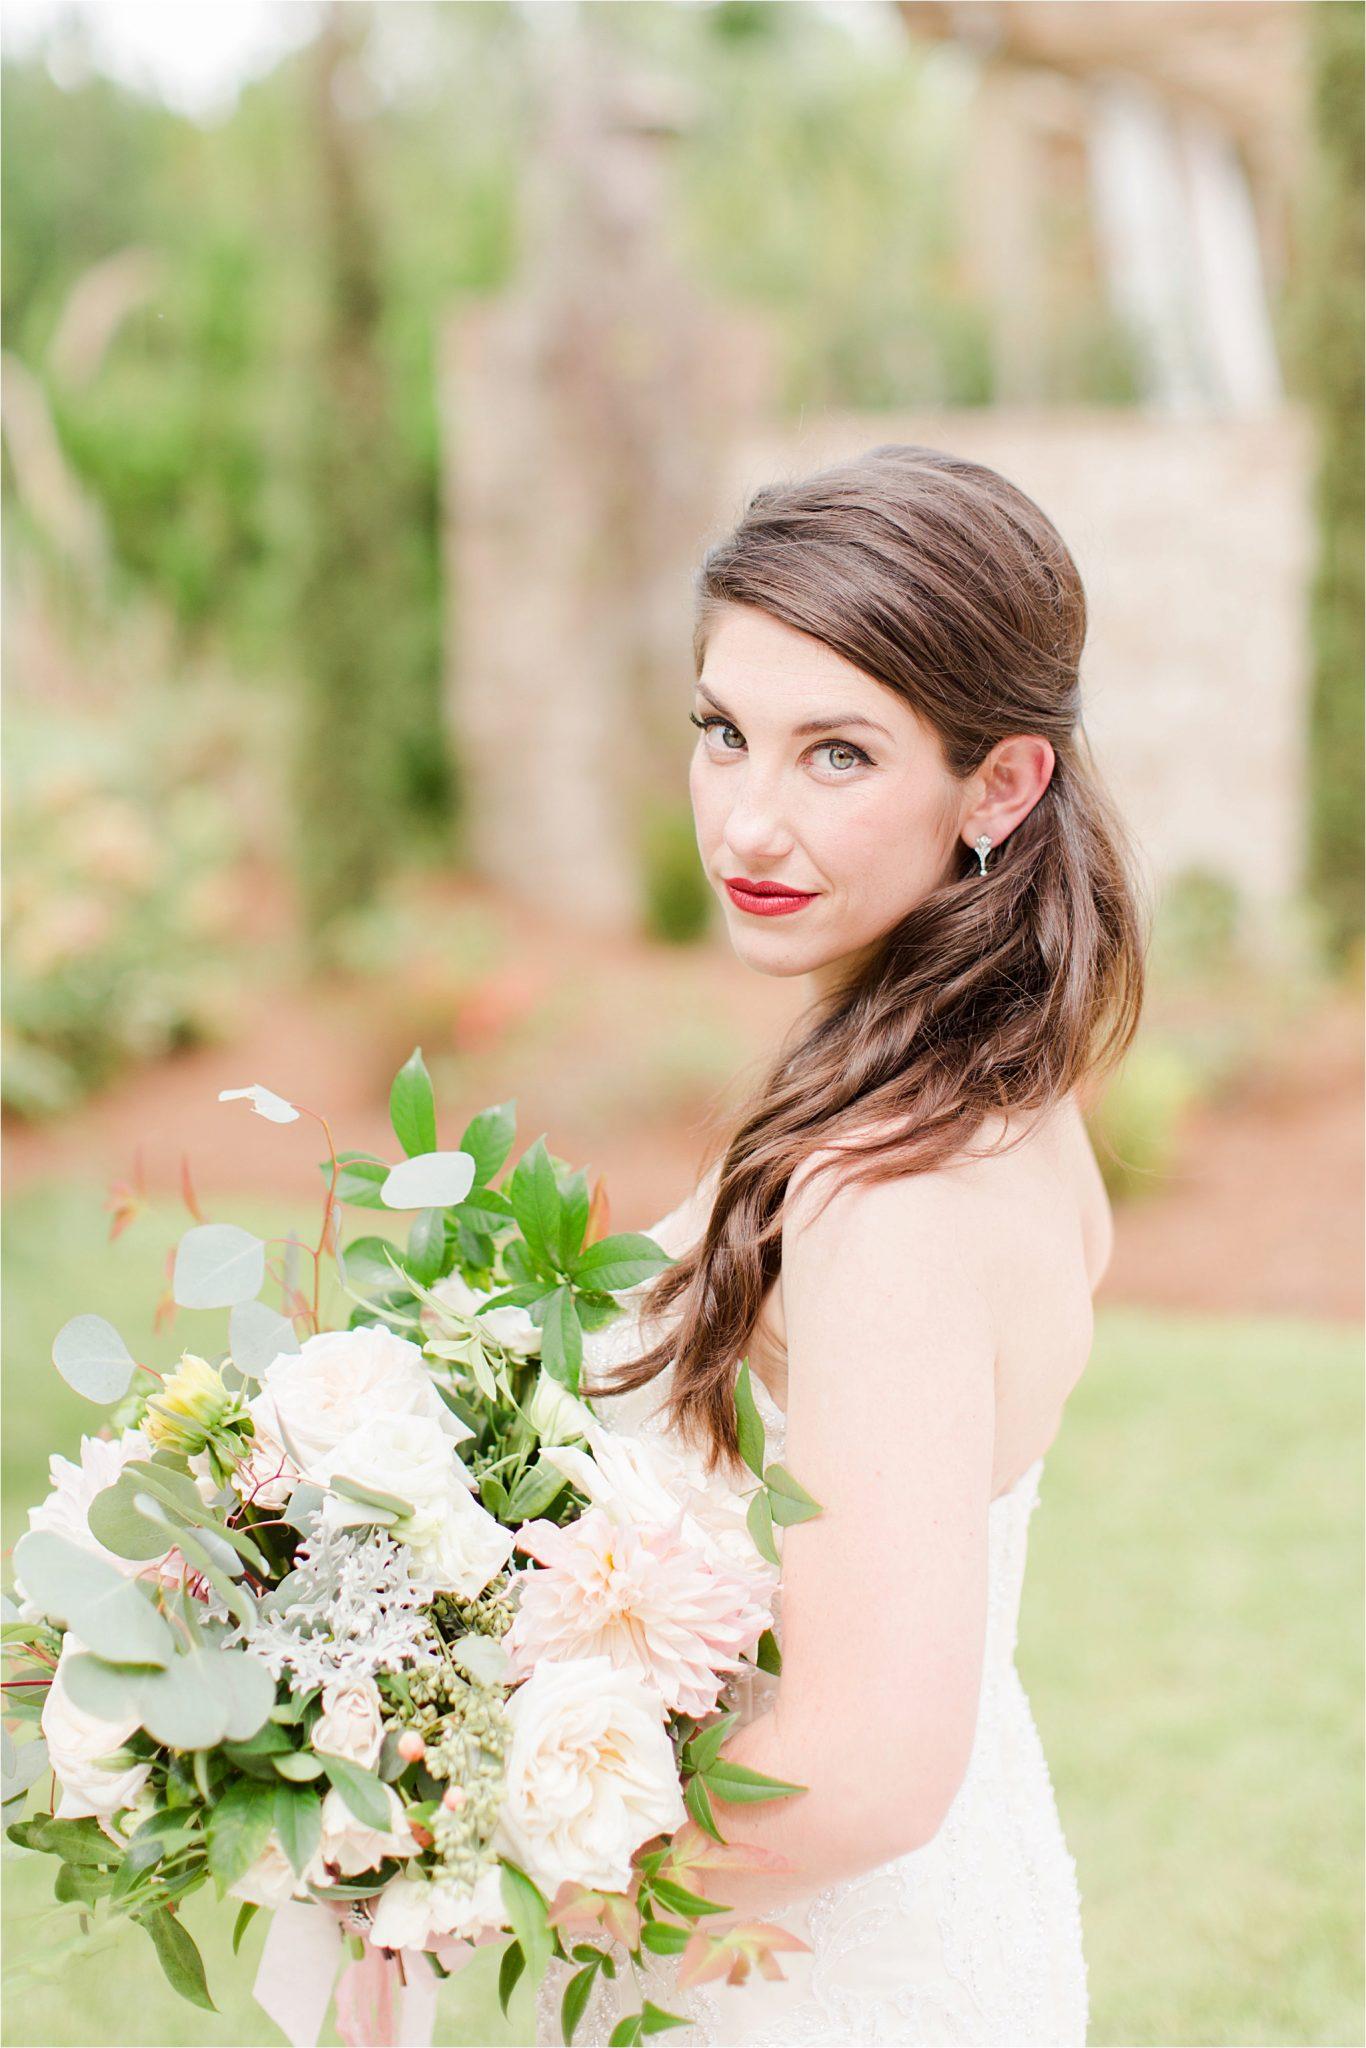 Bridal portraits-photos of the bride-wedding day-red lip-bright lip-alabama wedding photographer